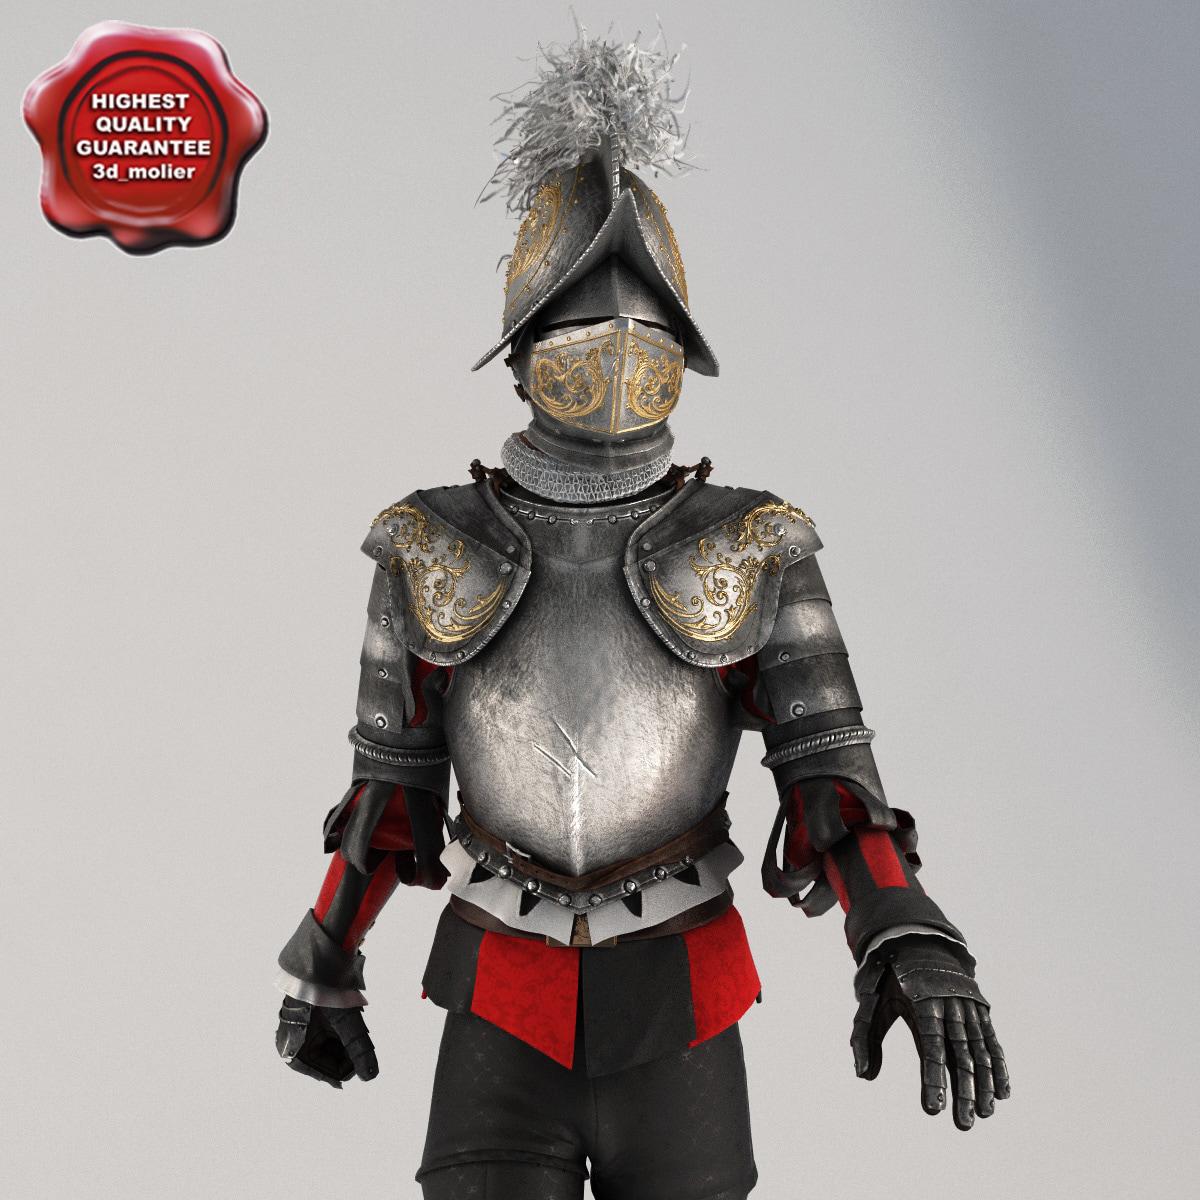 swiss guardsmen vatican knight 3d model